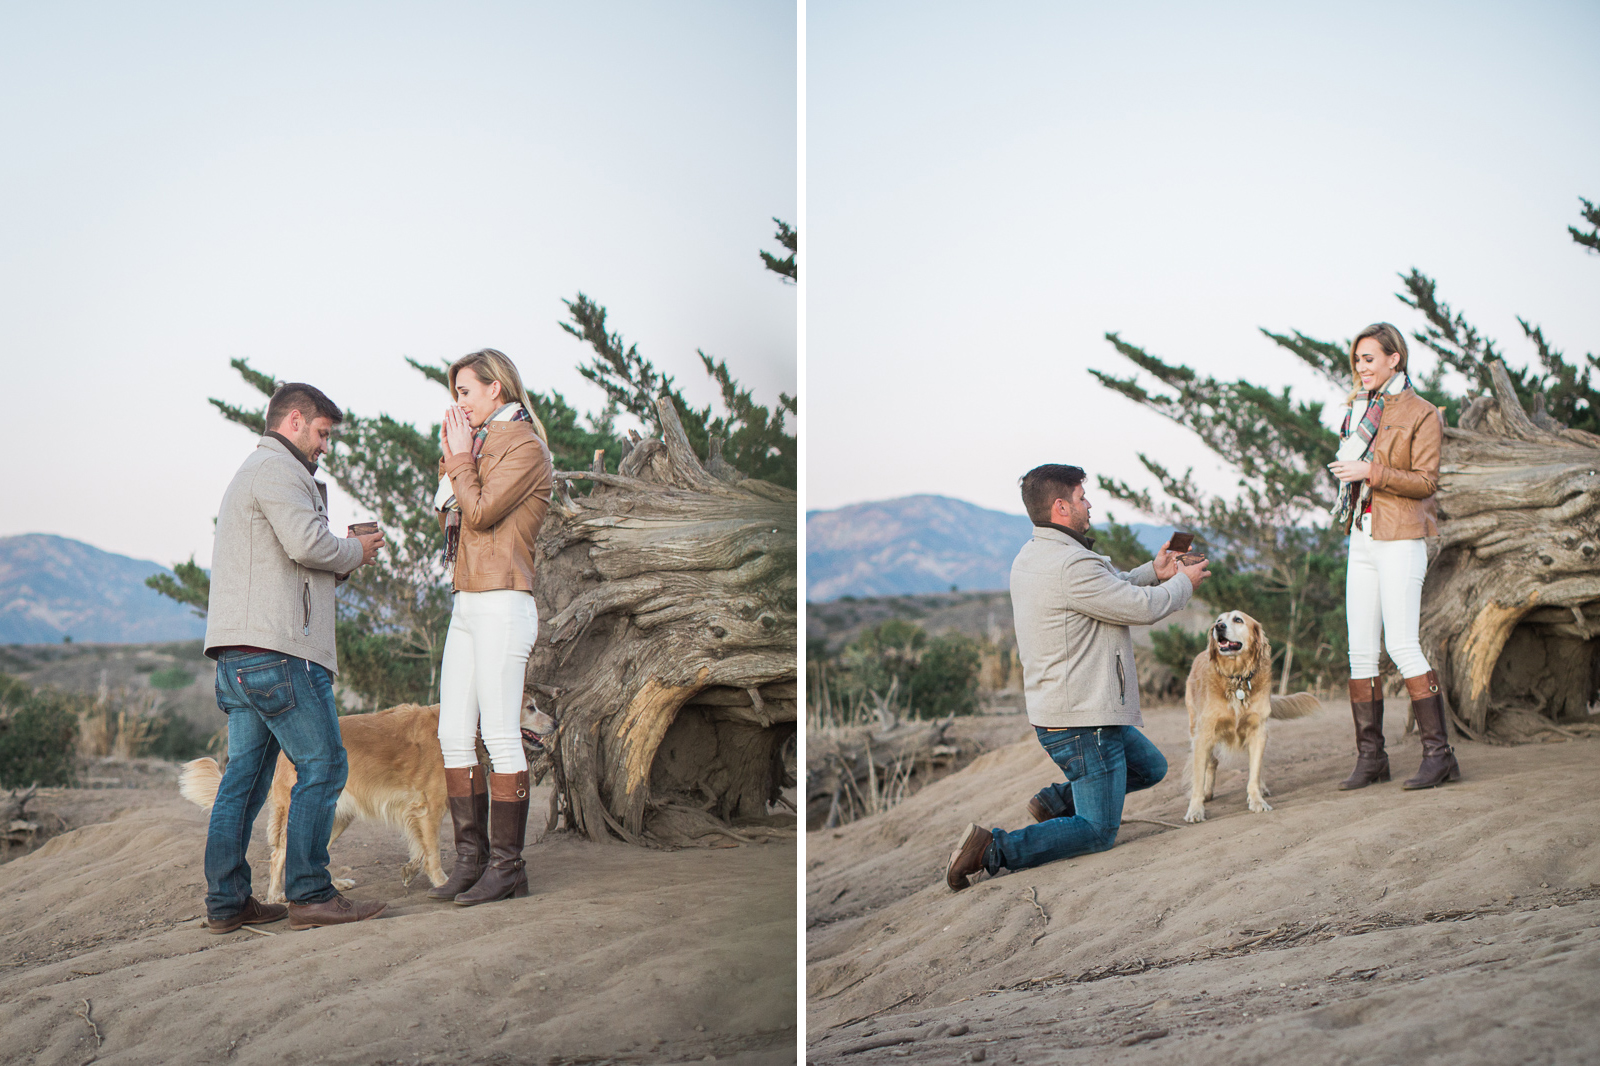 Santa Barbara Proposal to girlfriend down on one knee